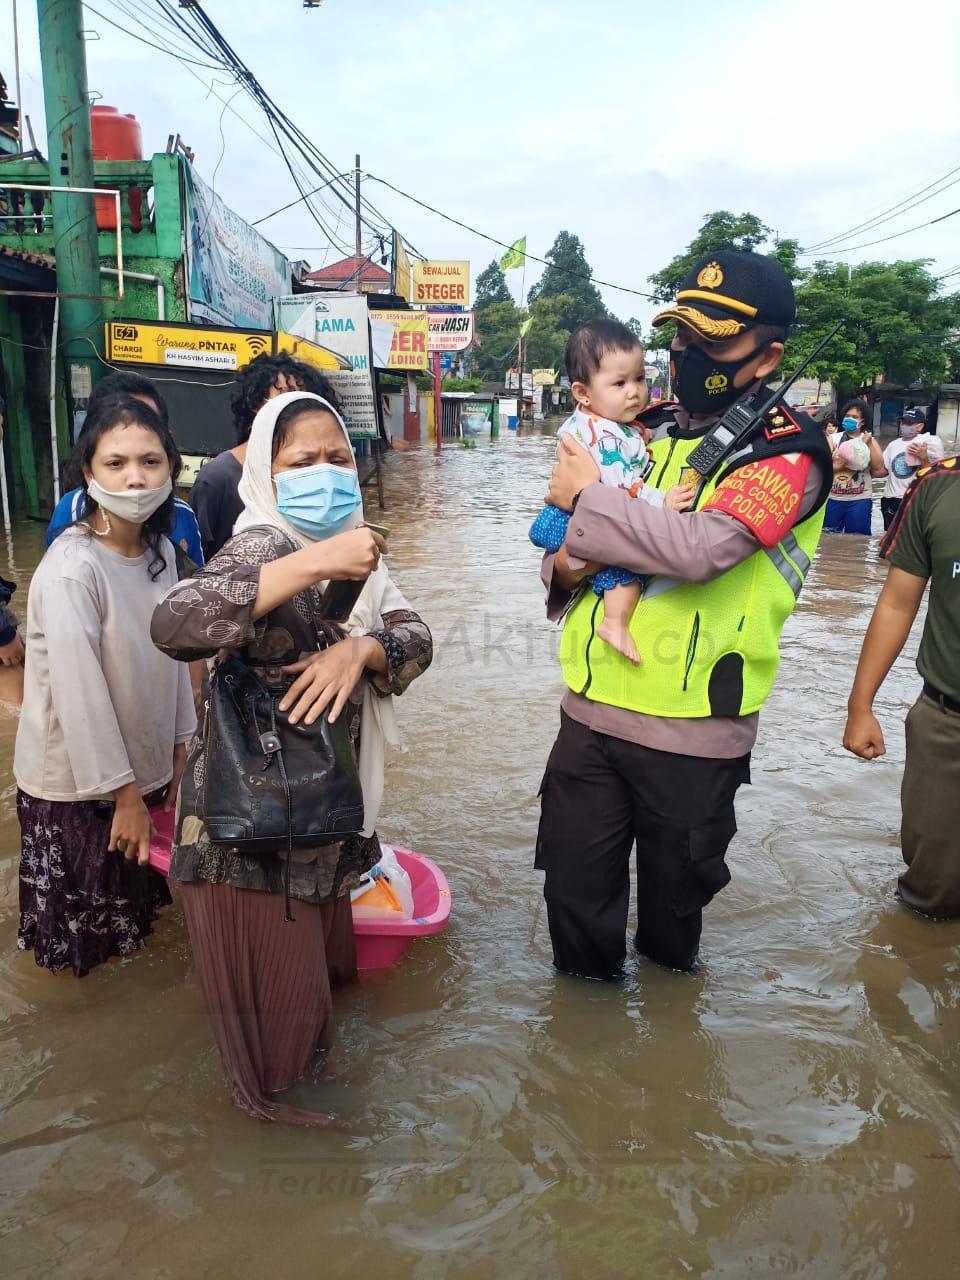 TNI-Polri Evakuasi Korban Banjir di Setiap Titik Wilayah DKI Jakarta 17 IMG 20210221 WA0037